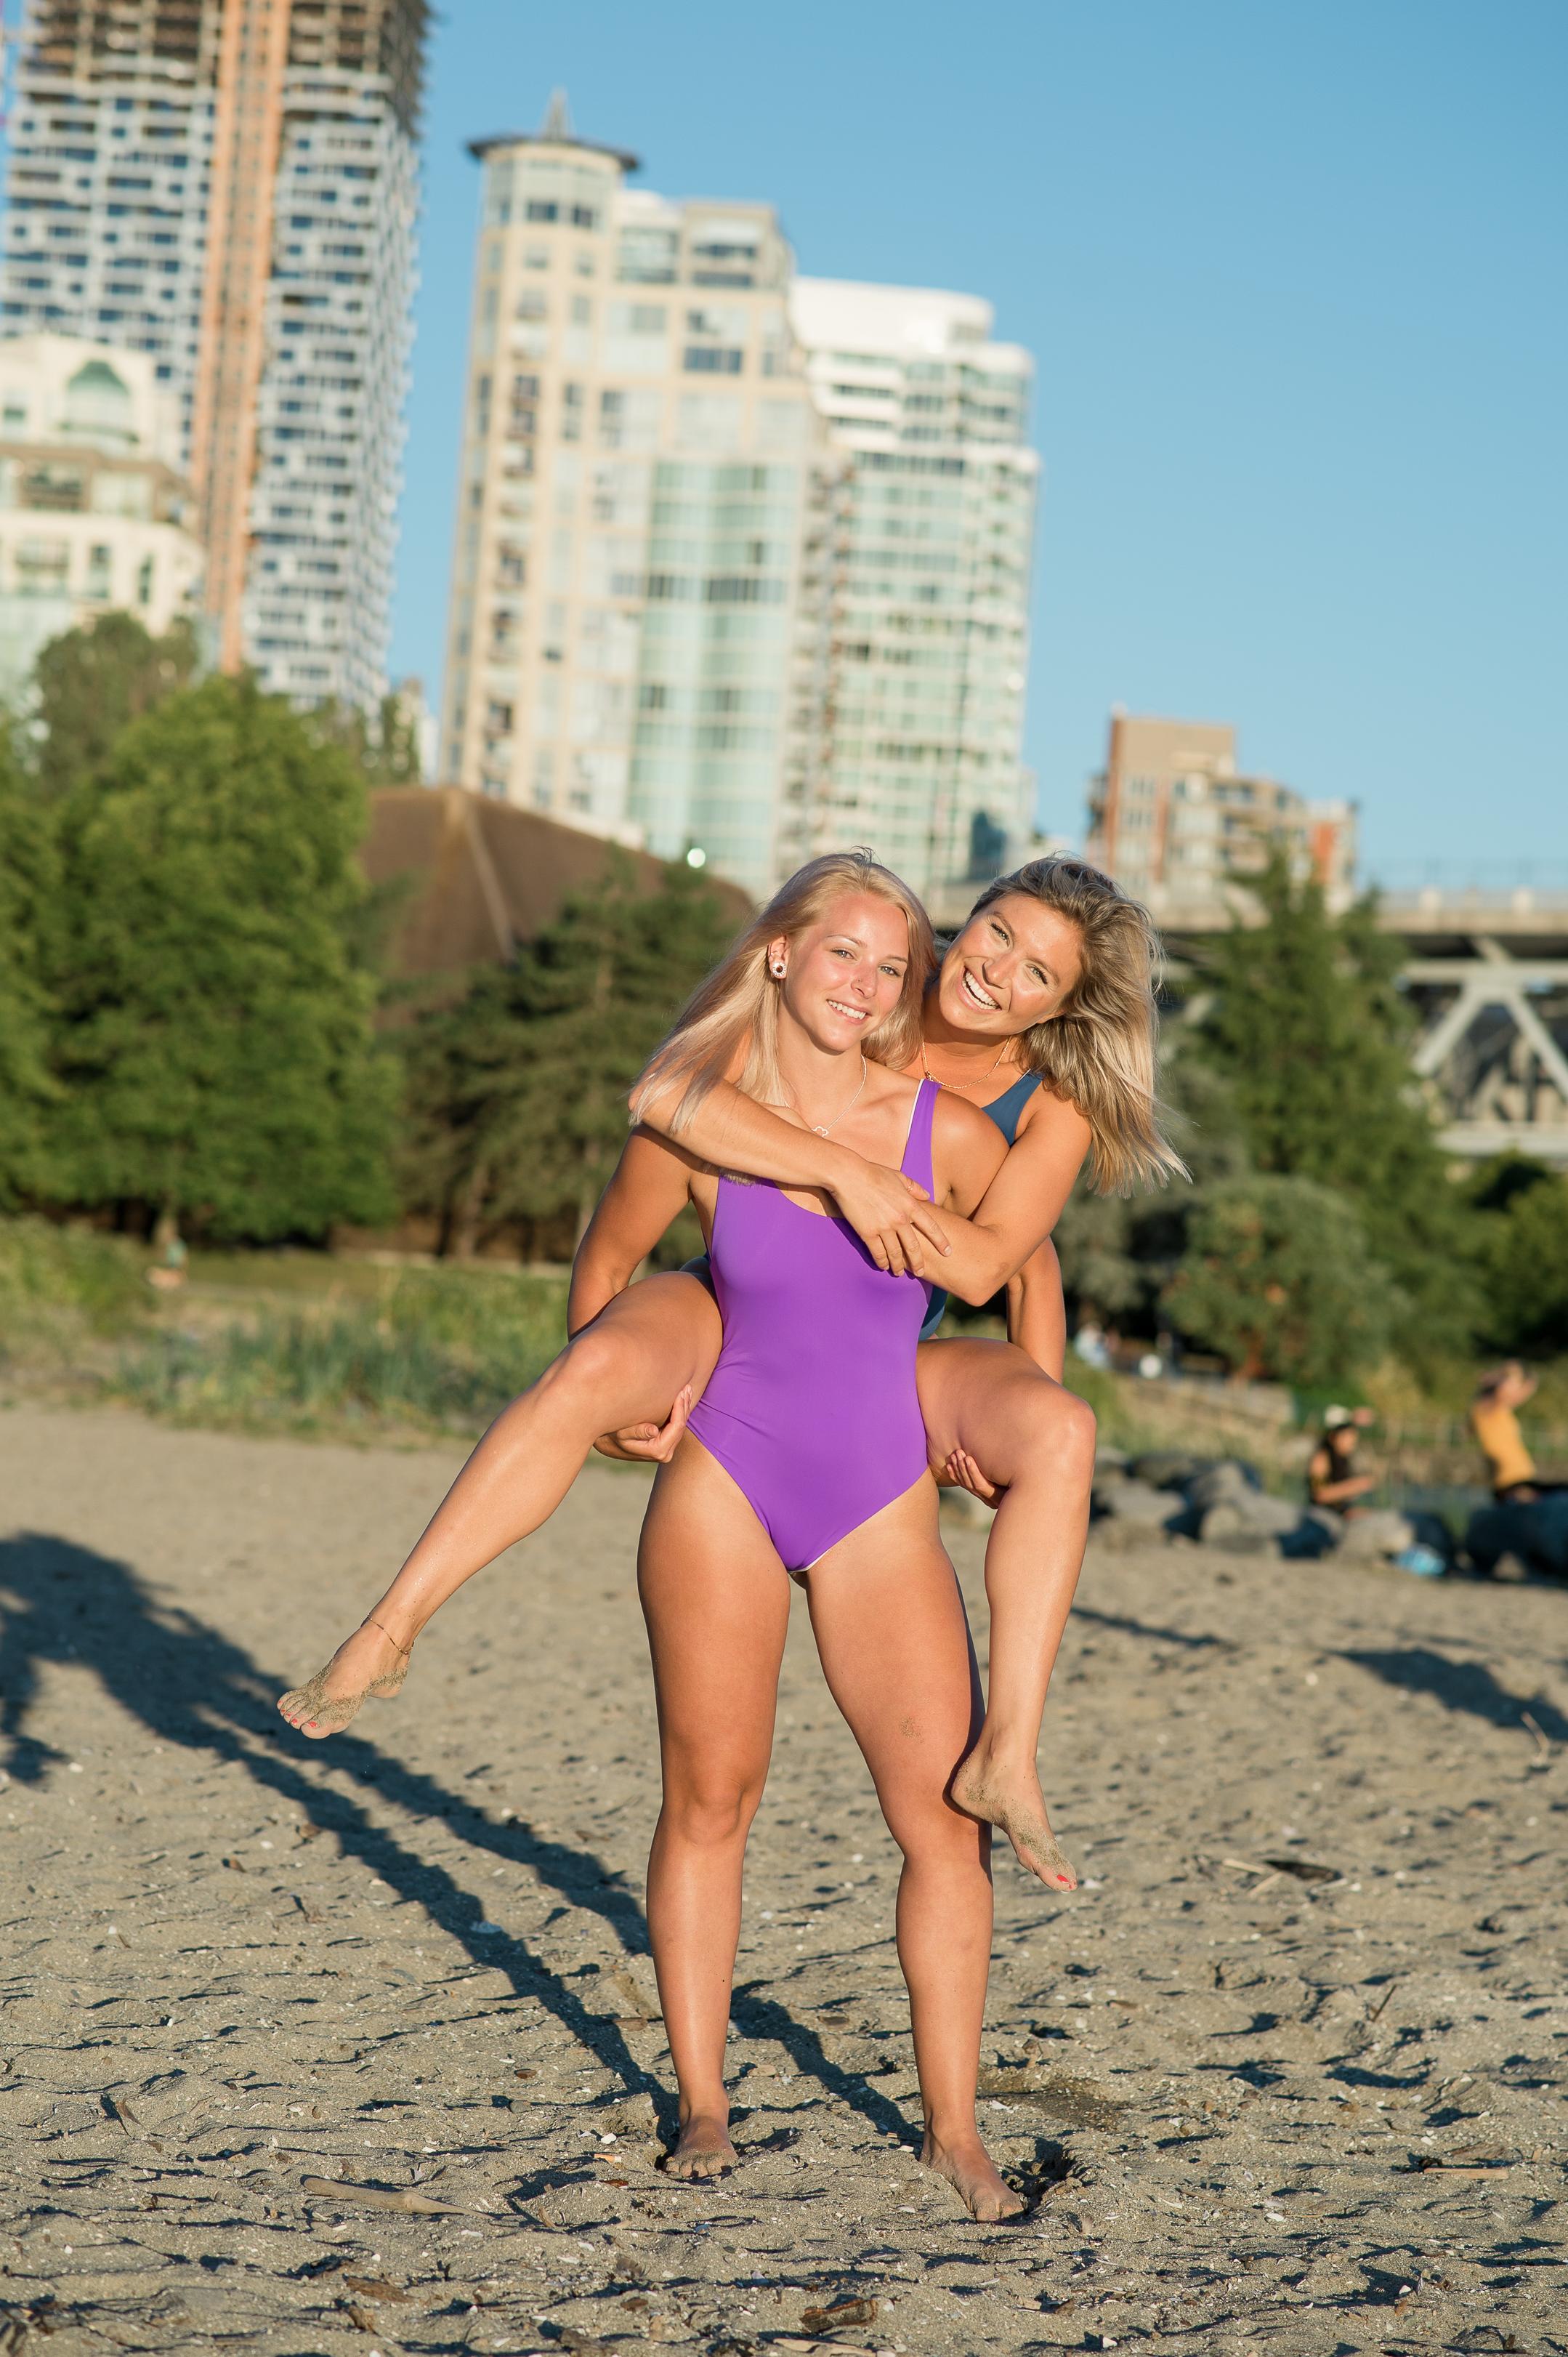 071118_UnionSwimwear-146 copy.jpg